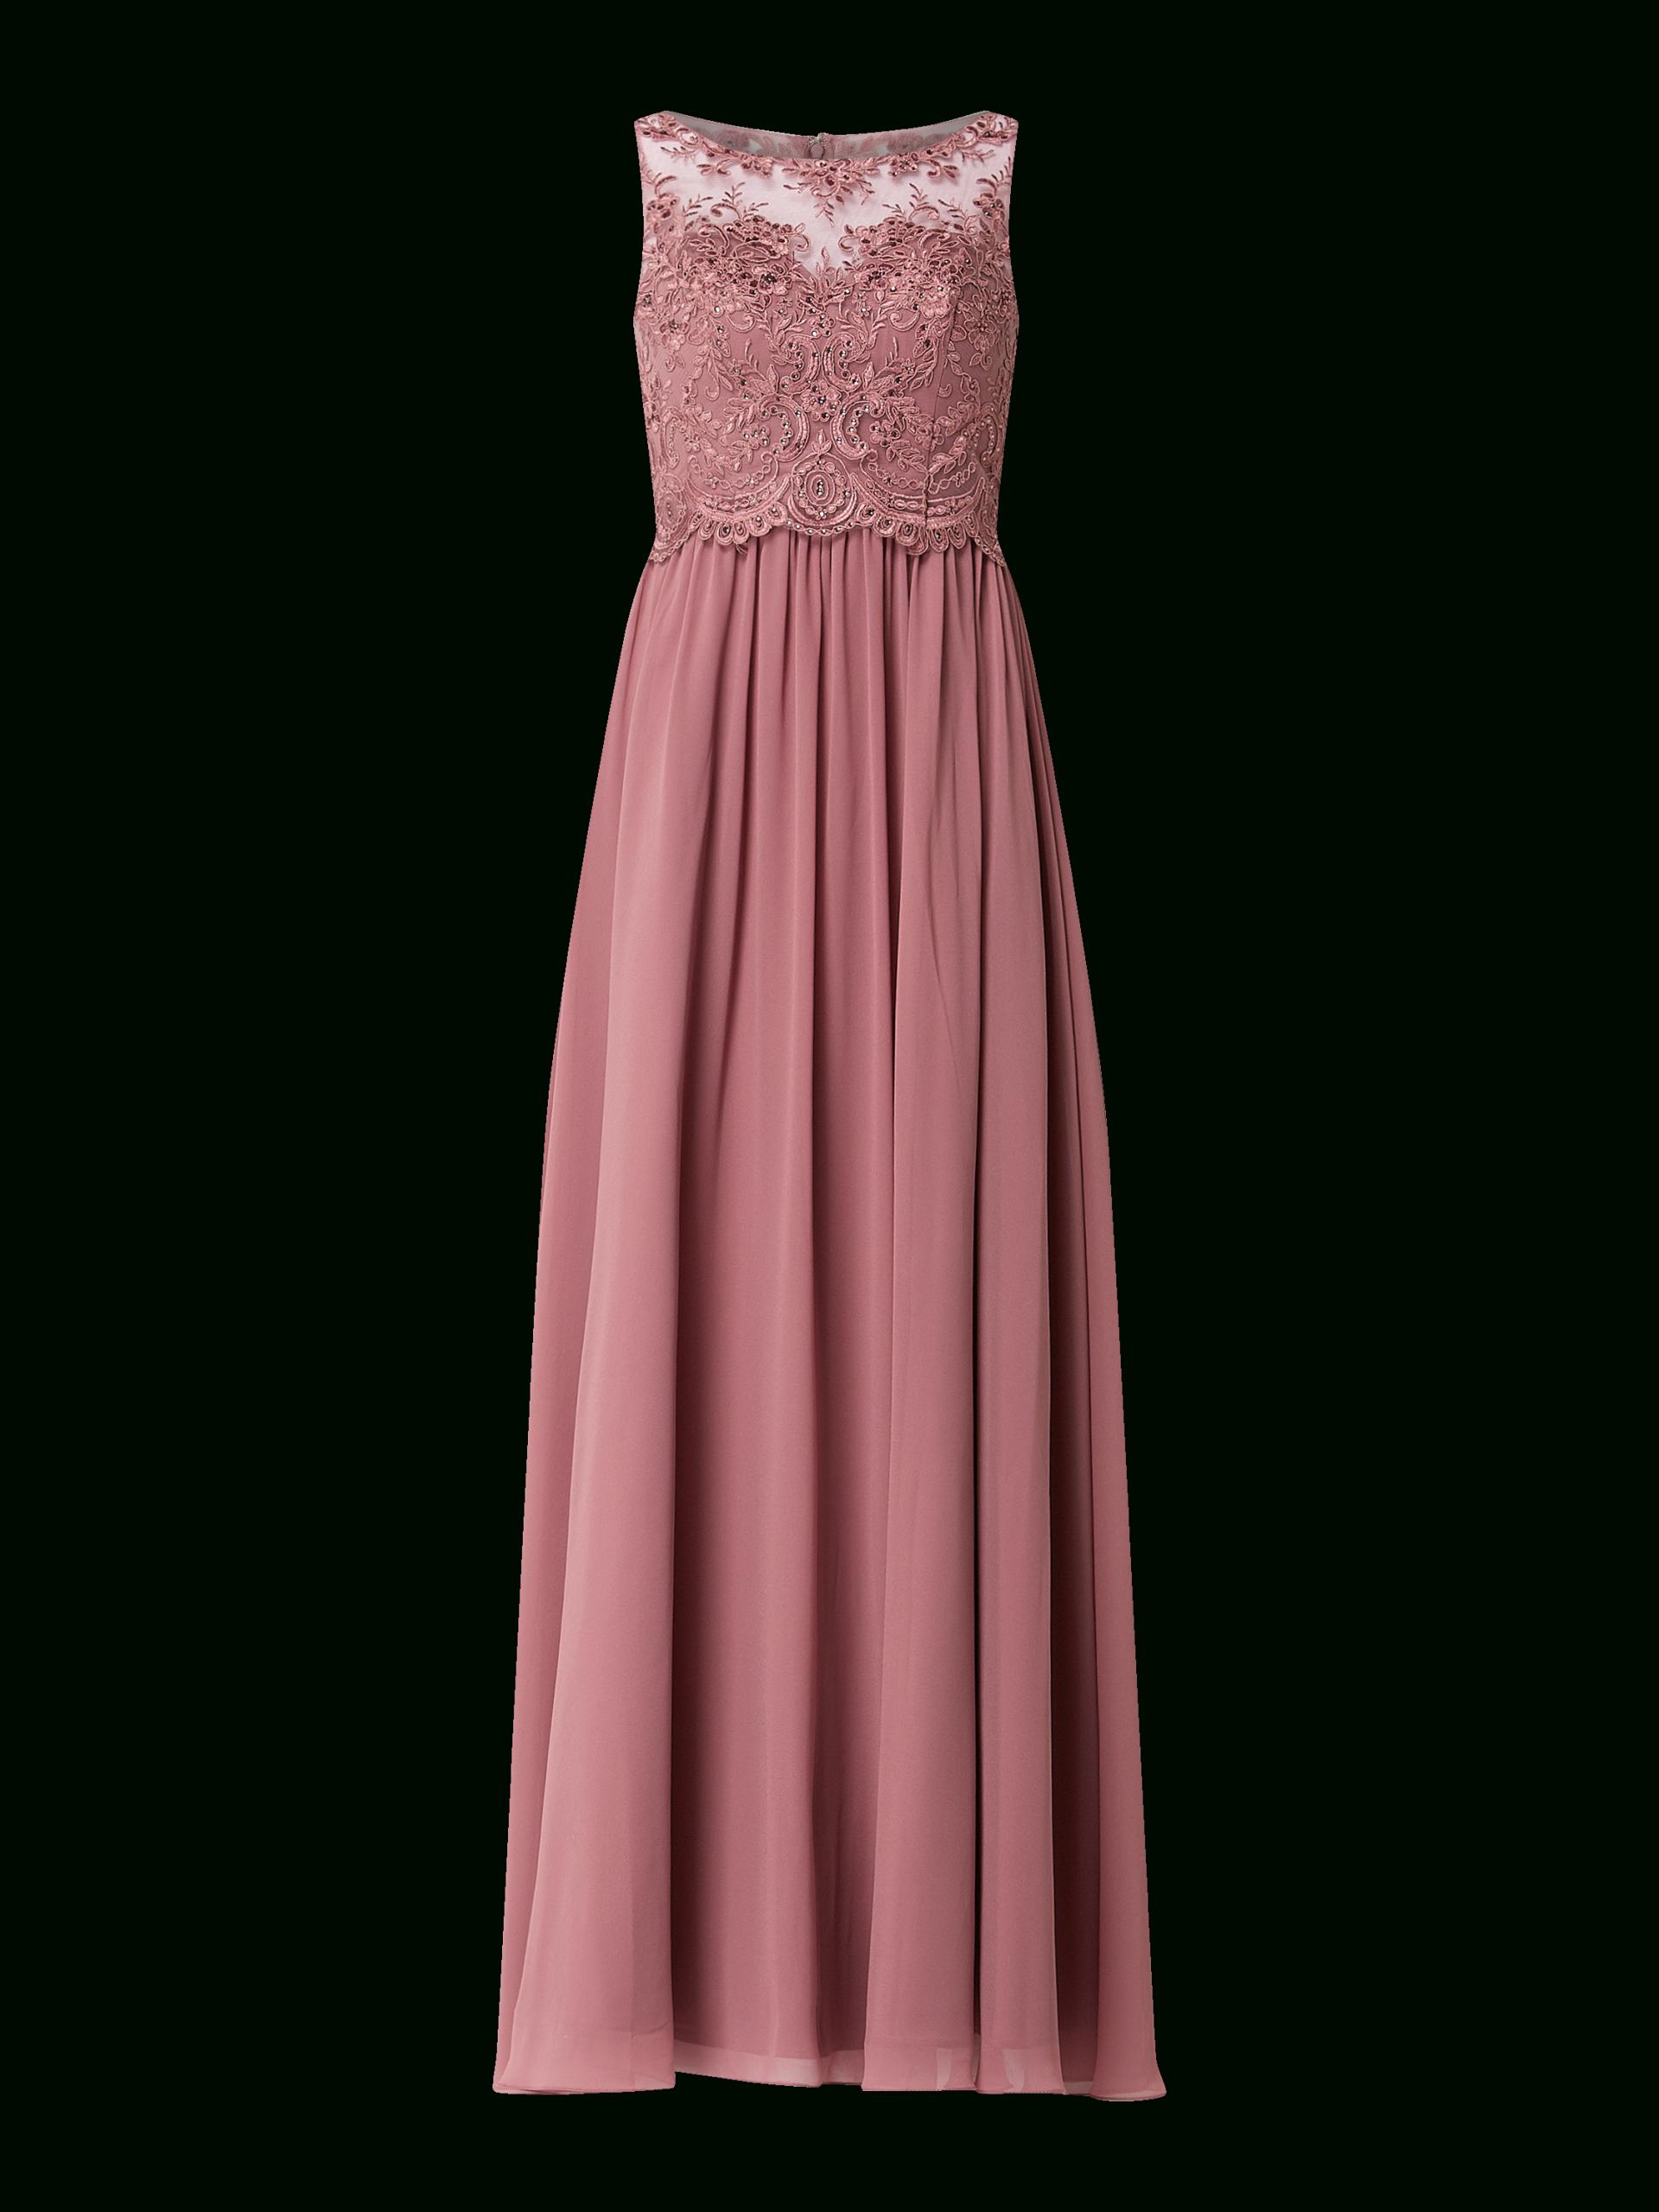 Formal Luxurius Laona Abendkleid Xxl Stylish17 Luxurius Laona Abendkleid Xxl Design